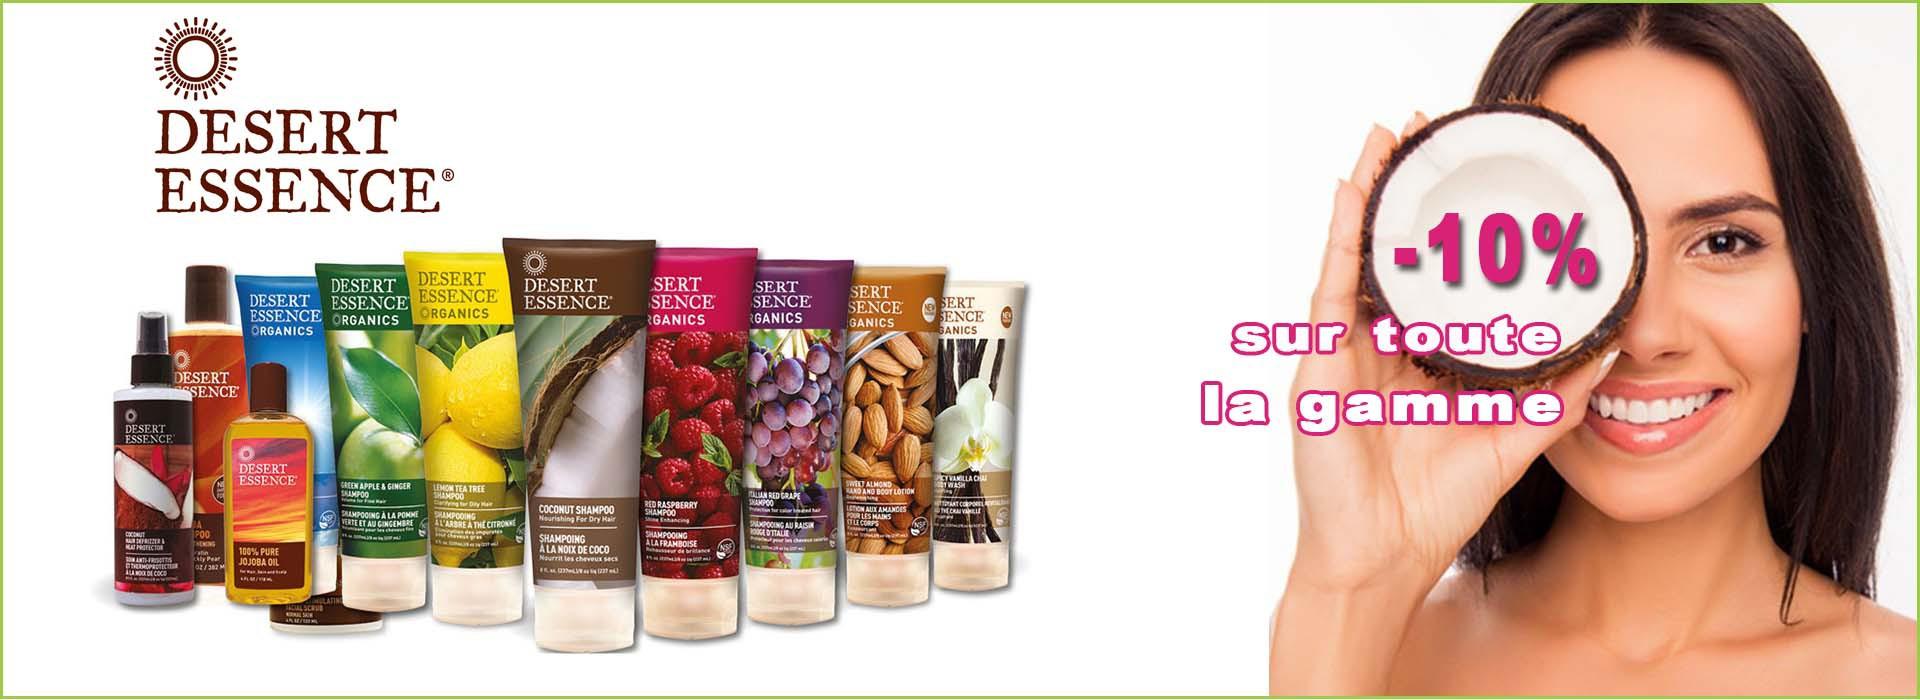 desert essence soins cosmetiques bio